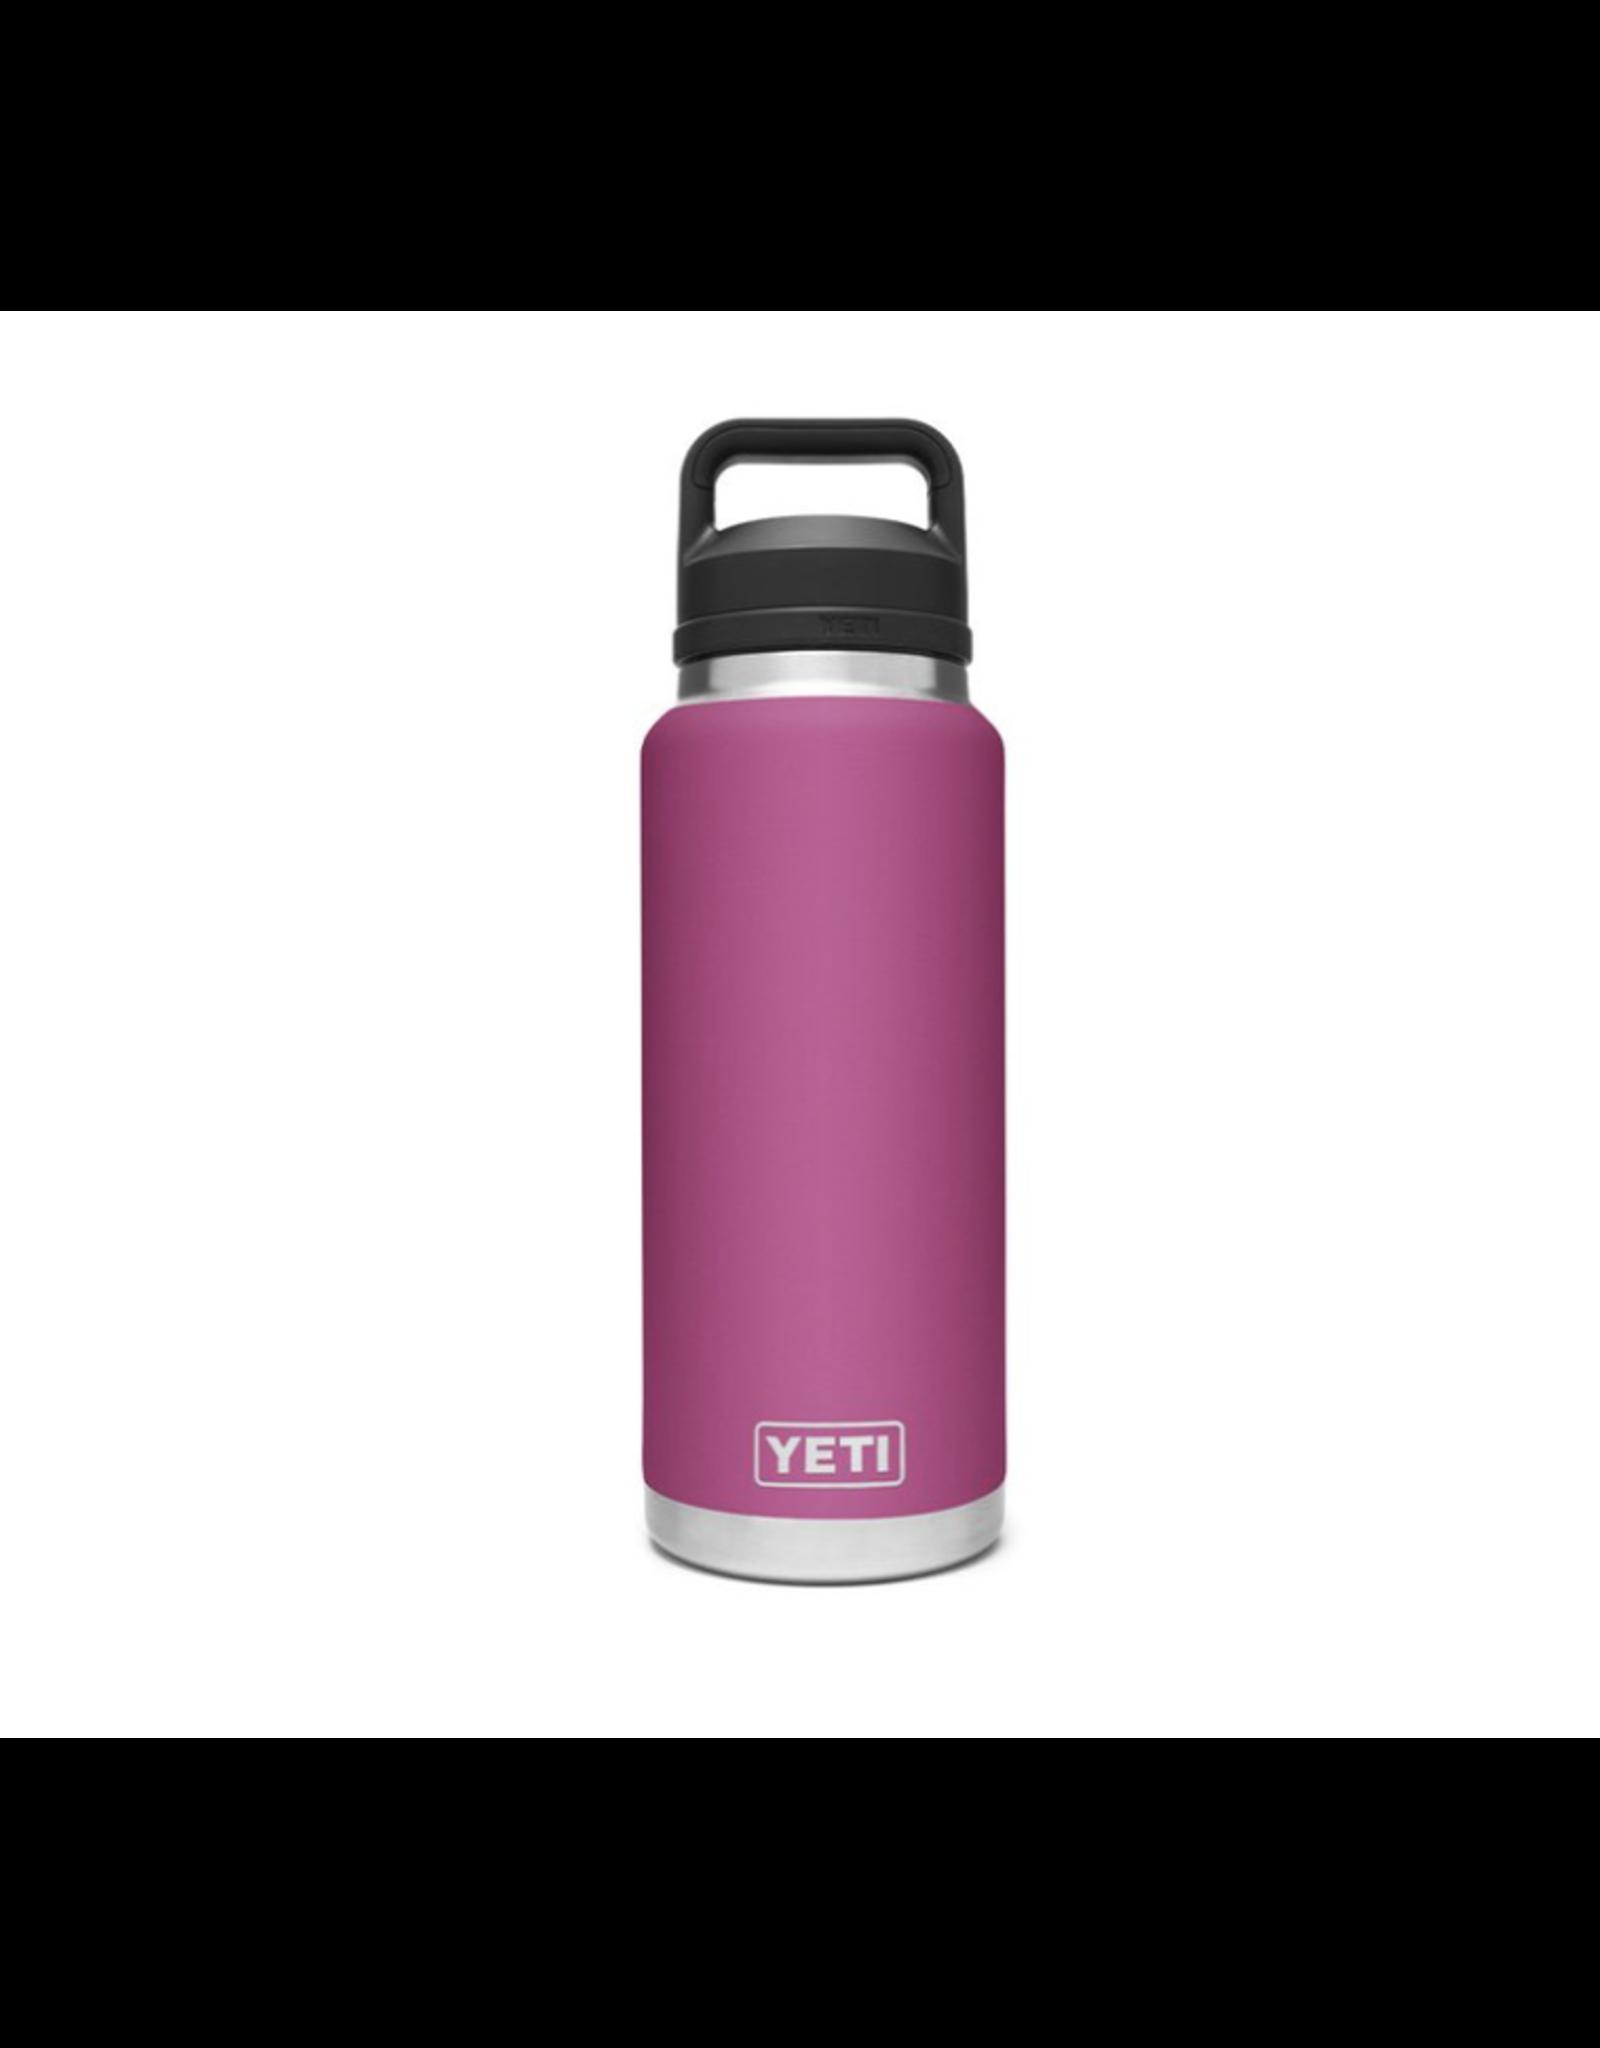 Yeti Rambler 36 Bottle Chug Prickly Pear Pink